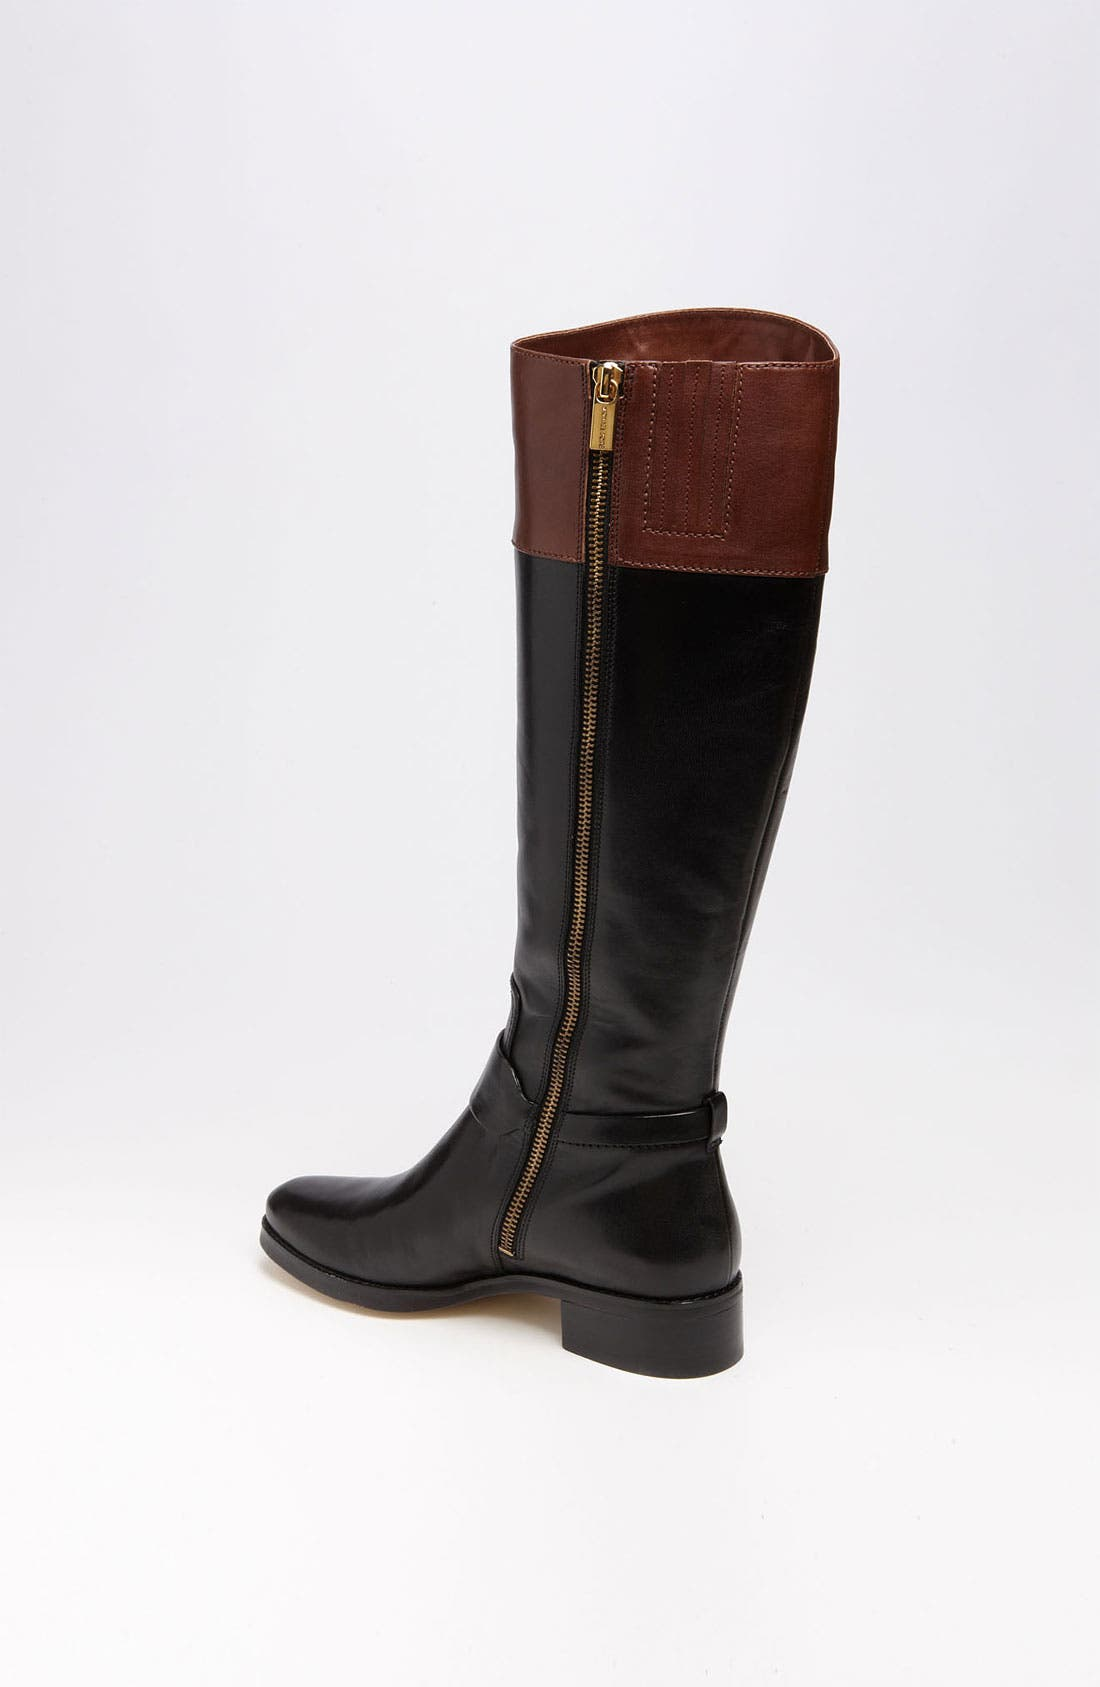 MICHAEL MICHAEL KORS,                             'Fulton' Harness Boot,                             Alternate thumbnail 4, color,                             014